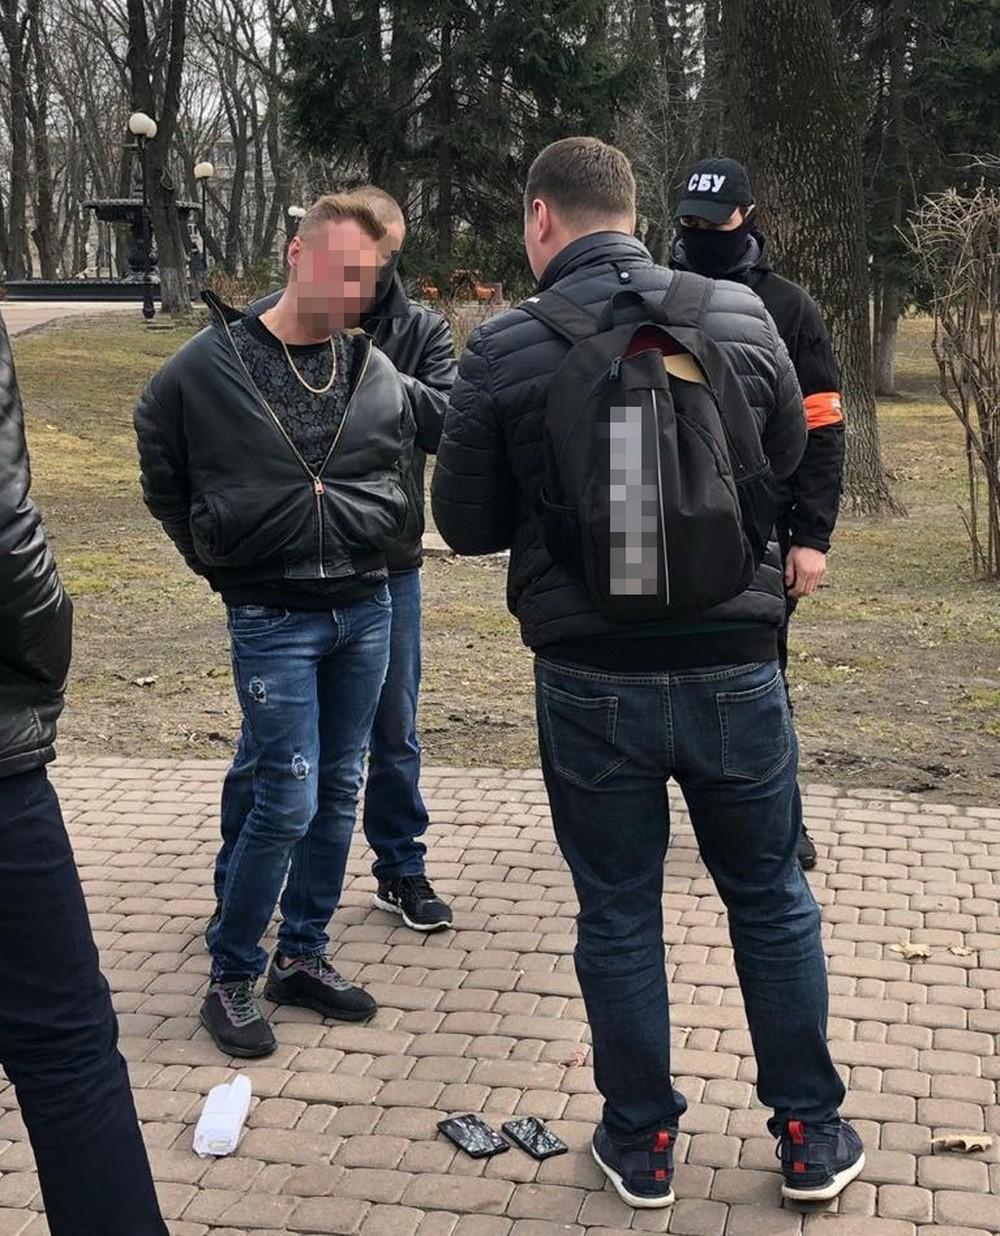 фото пресс-служба СБУ